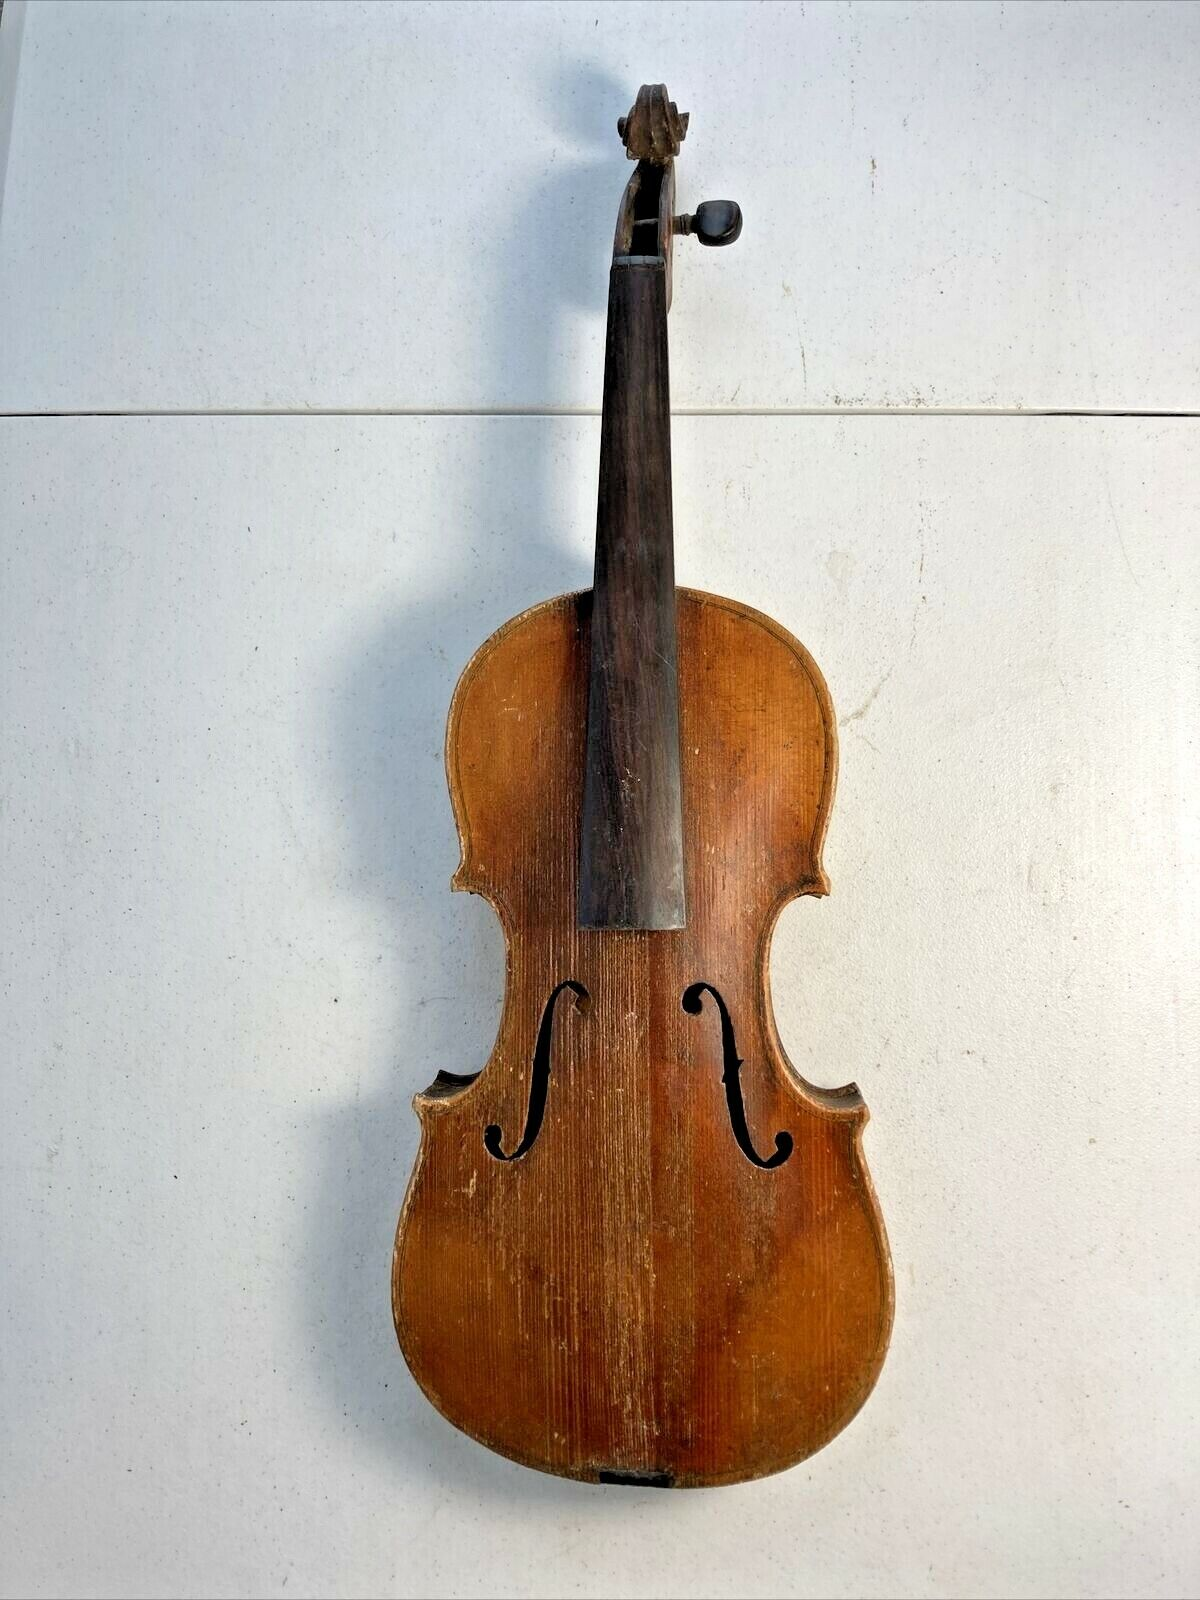 A S ANTONIUS STRADIVARIUS Model ANNO 1736 Early 20th Century VIOLIN 14 - $38.00